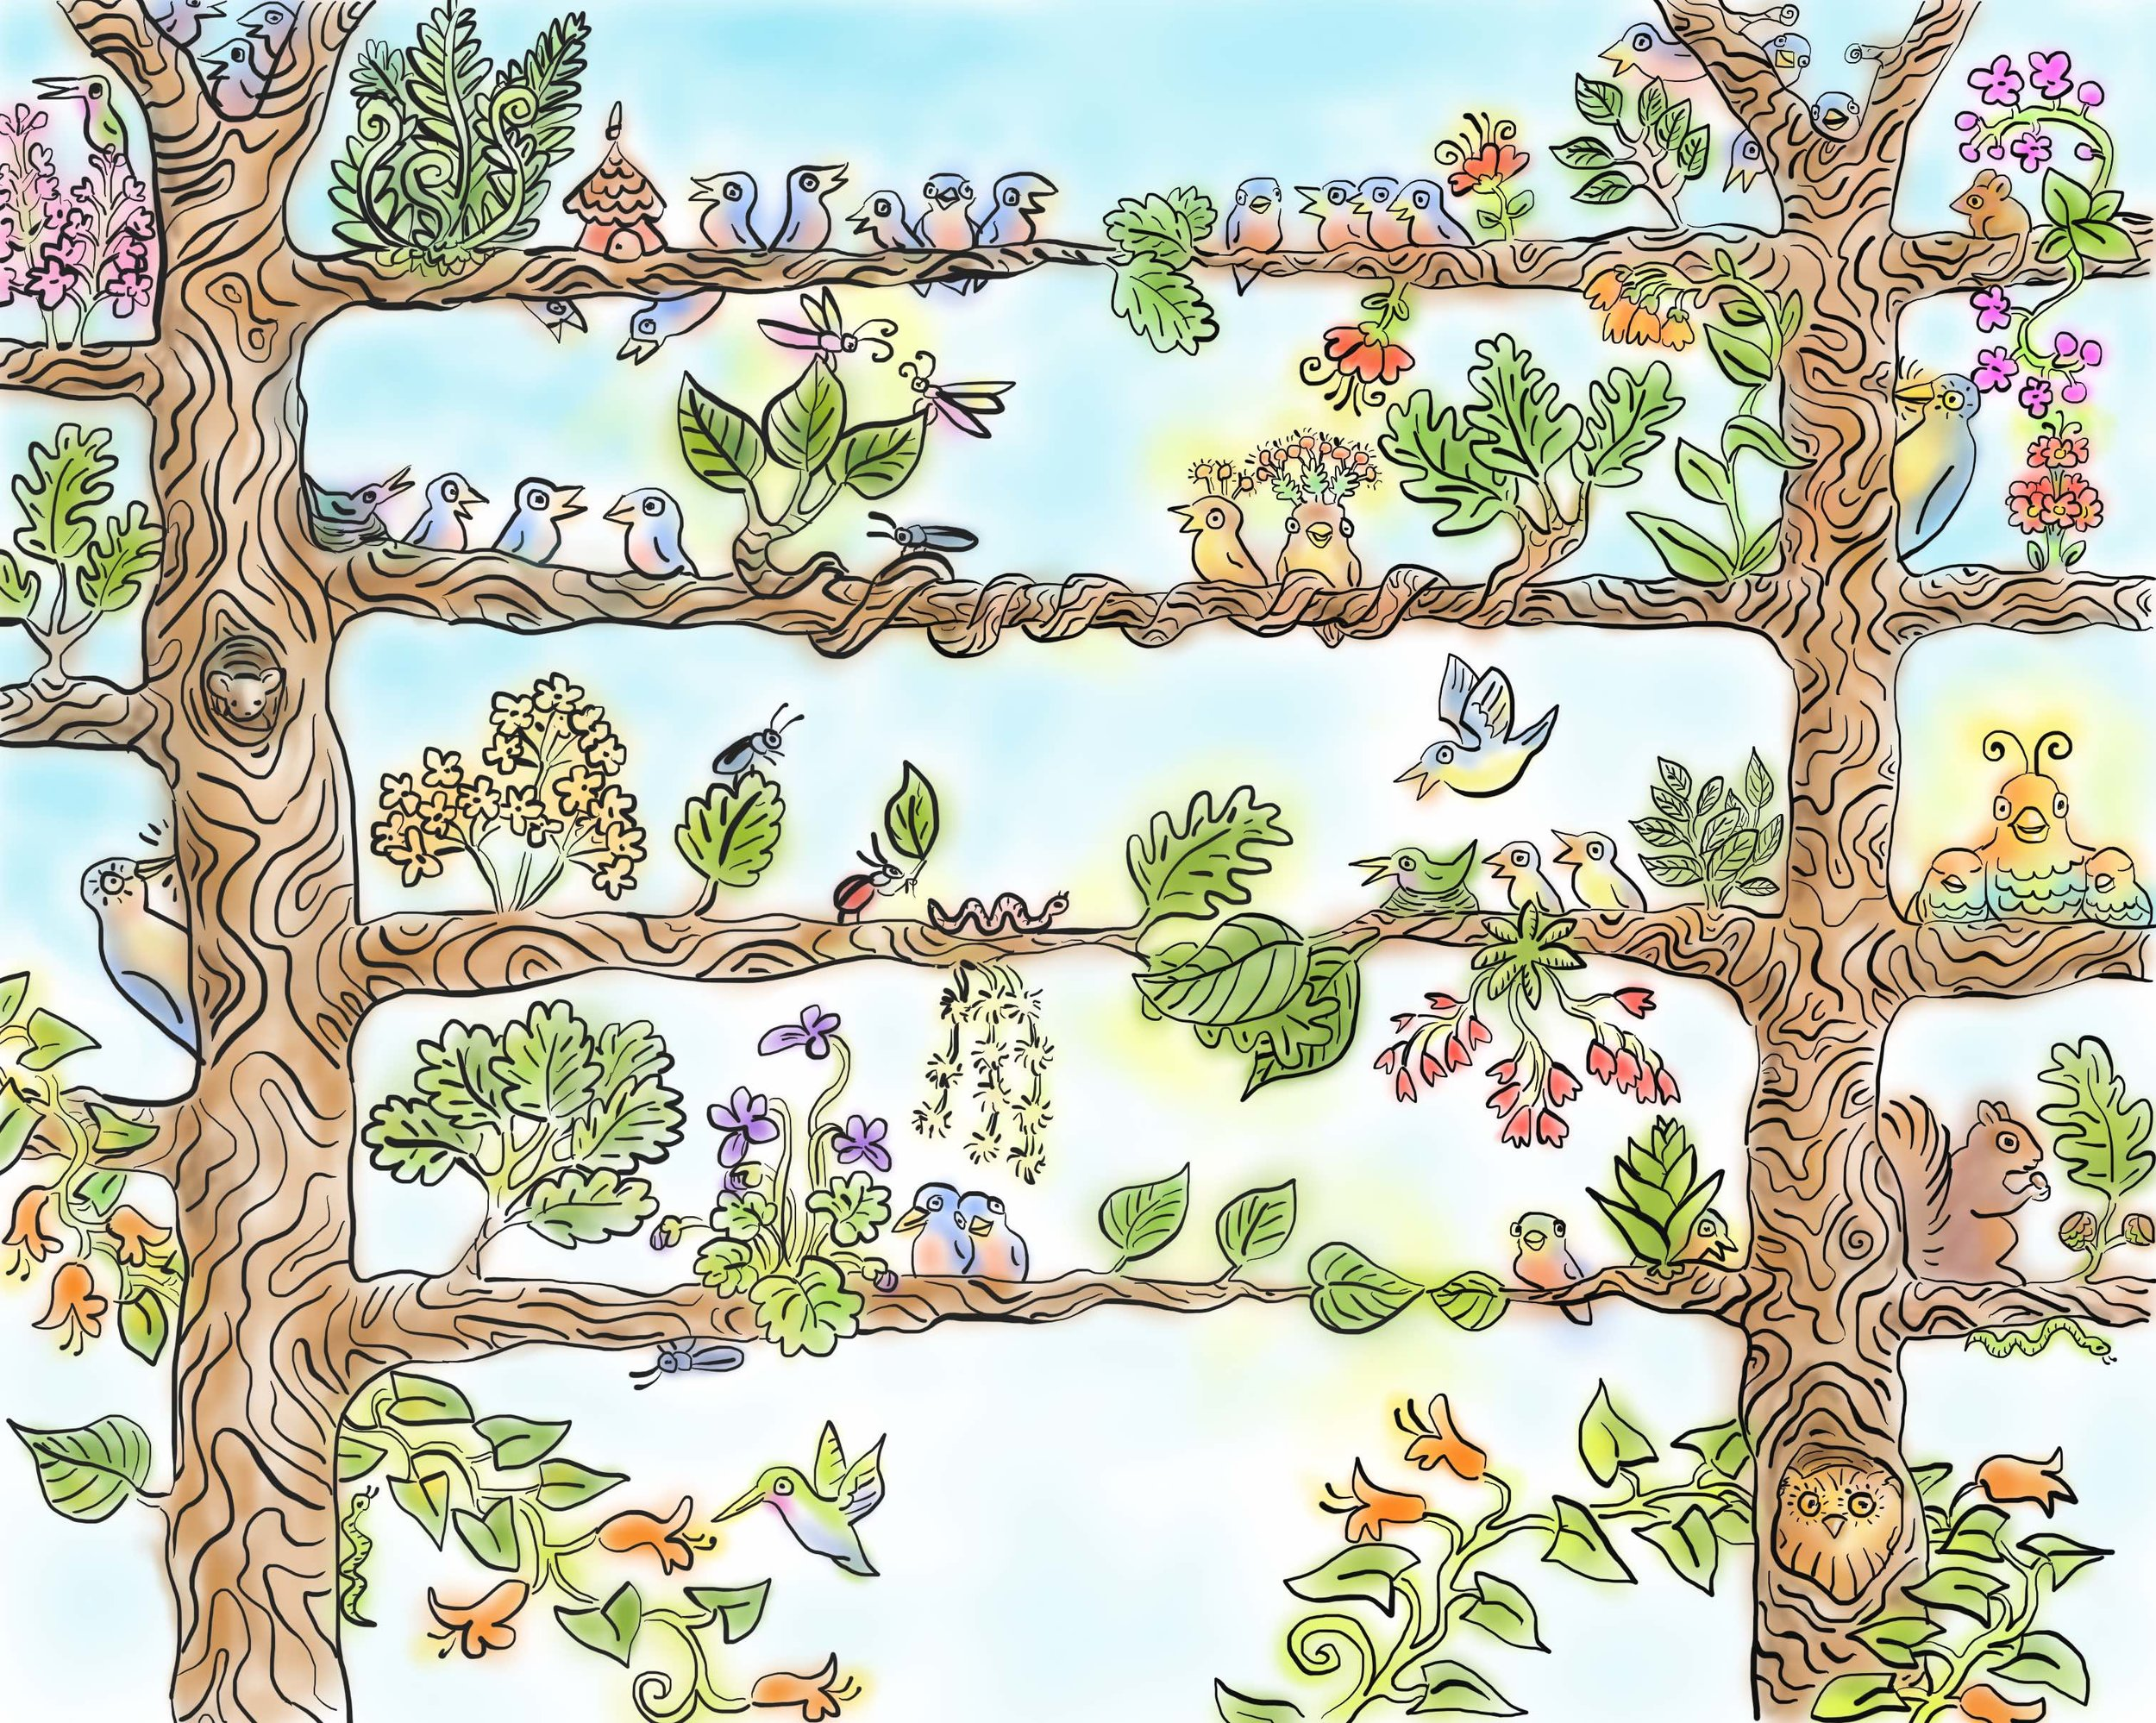 singing birds & 2 trees2.jpeg